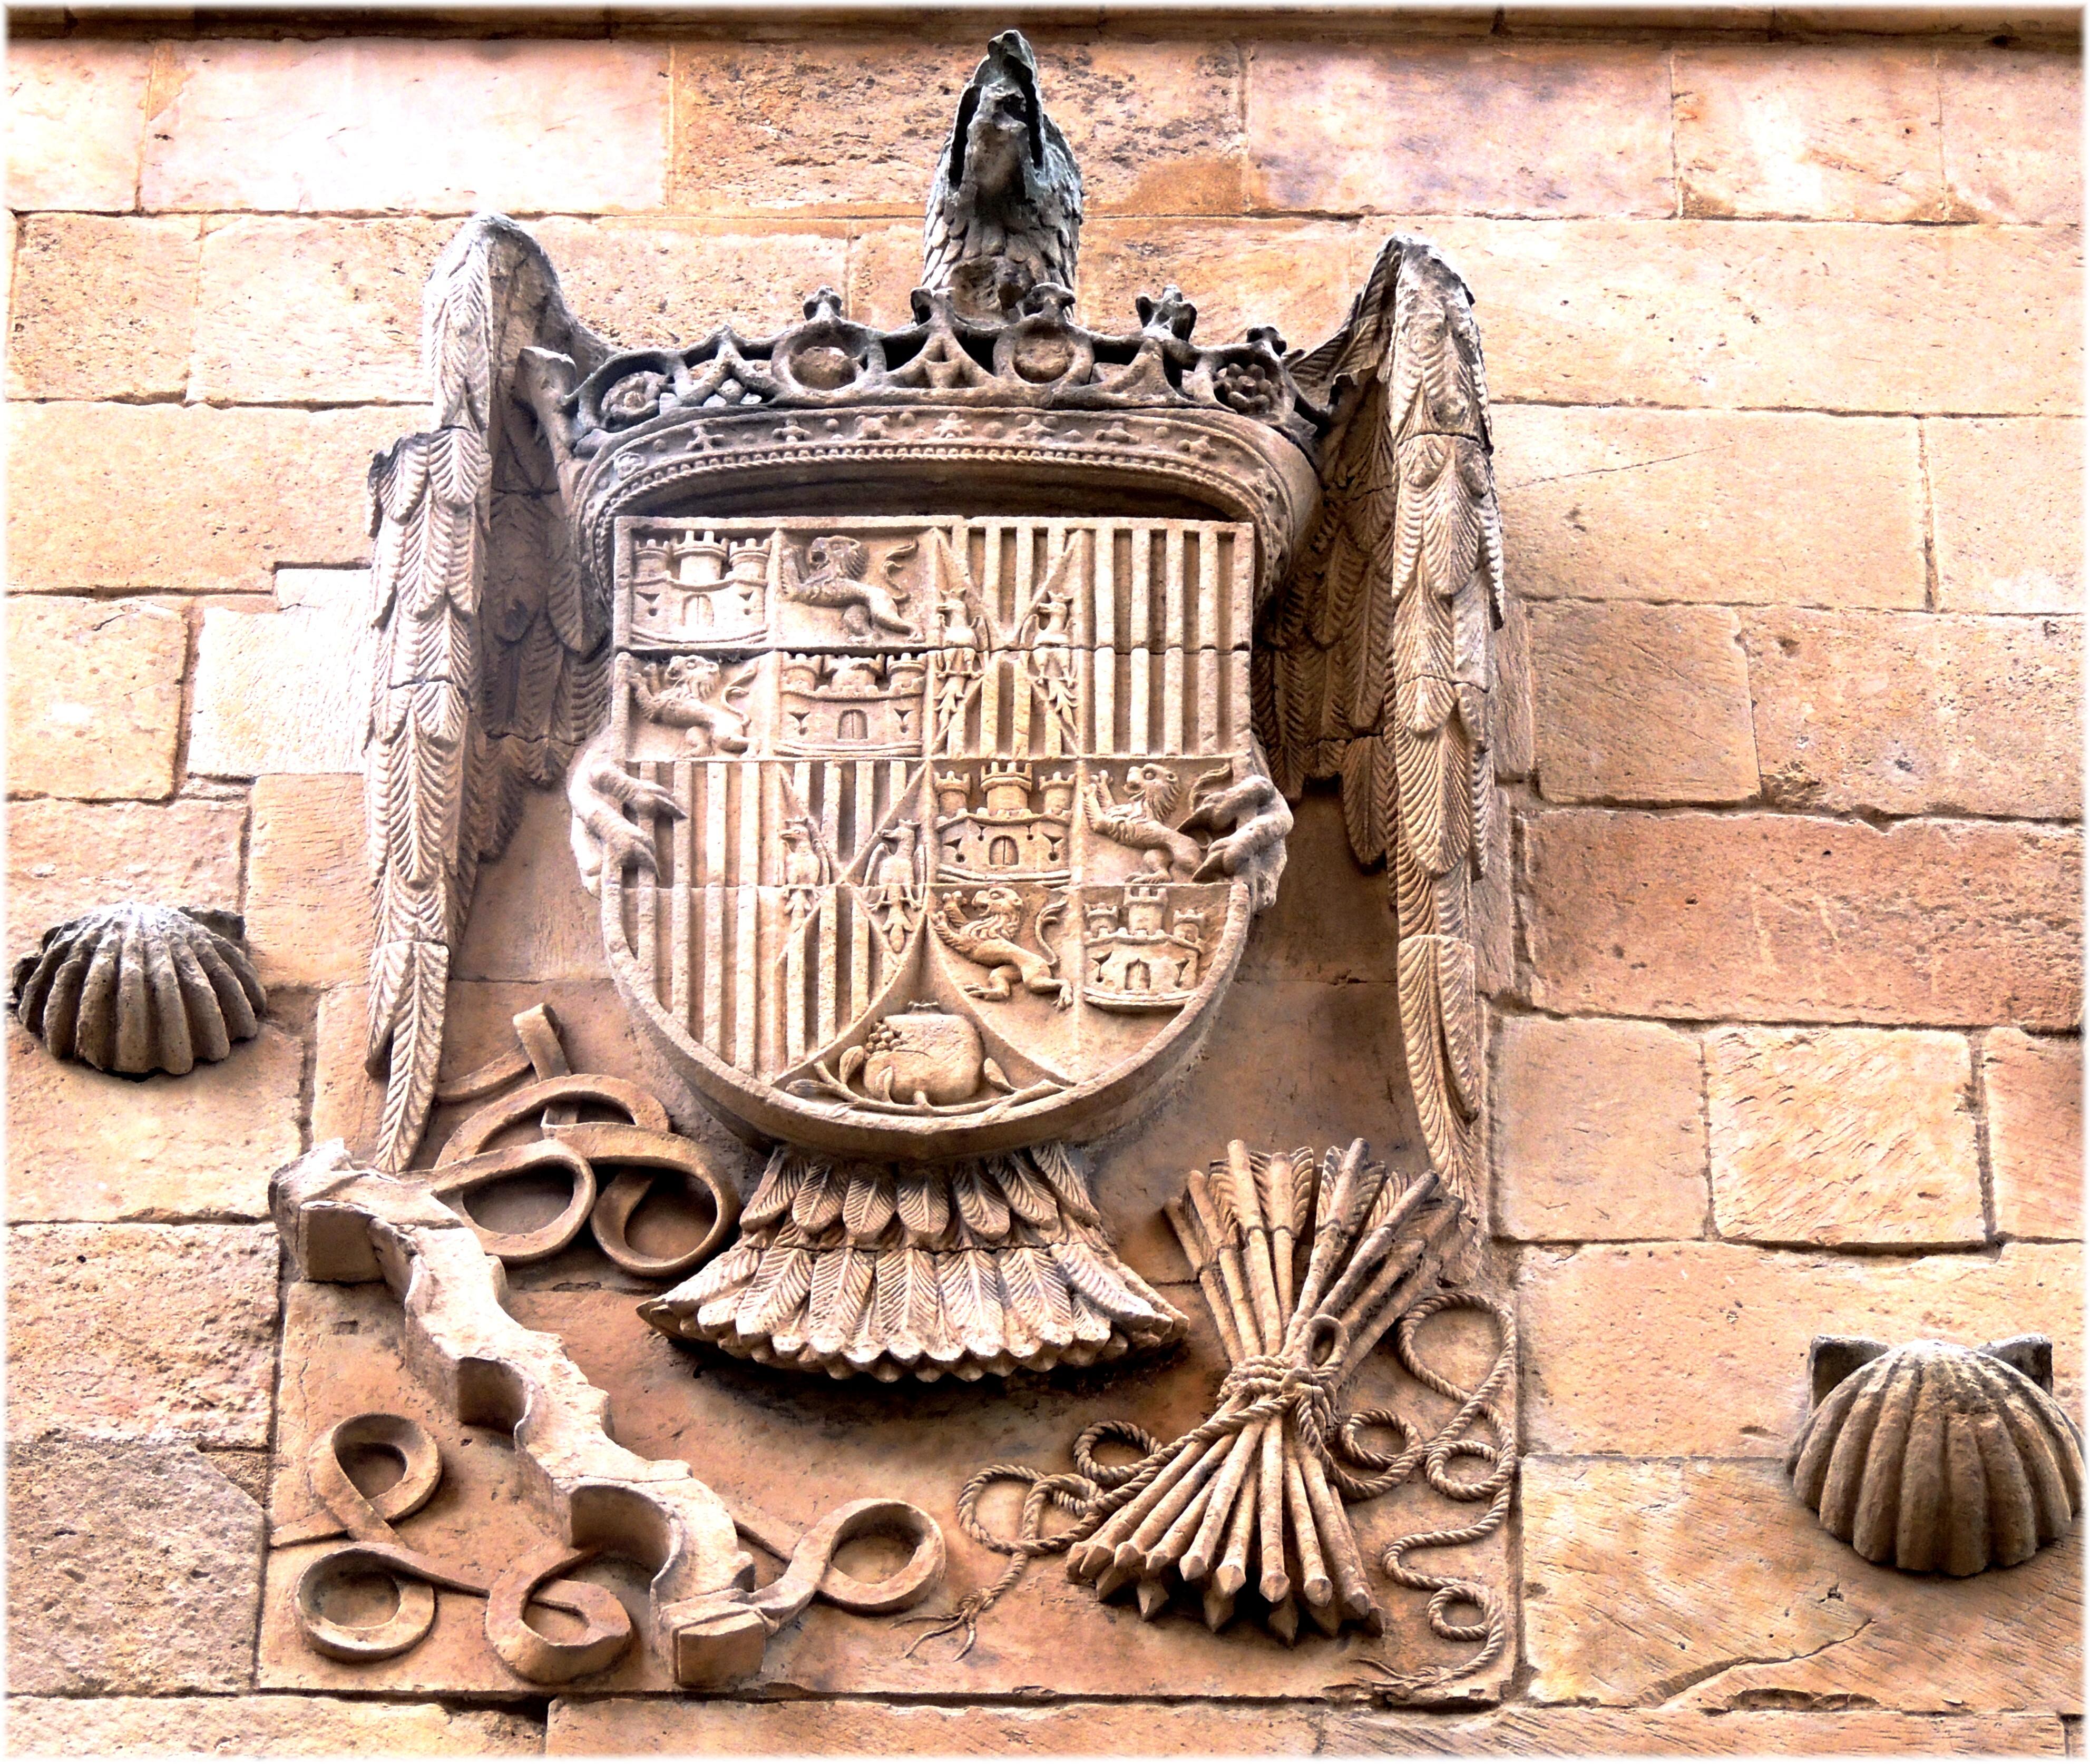 Madera Piedra Europa Mueble Escultura Art España Espagne Templo Europa  Escultura Salamanca Piedra Heraldica Castillayleon Espanha